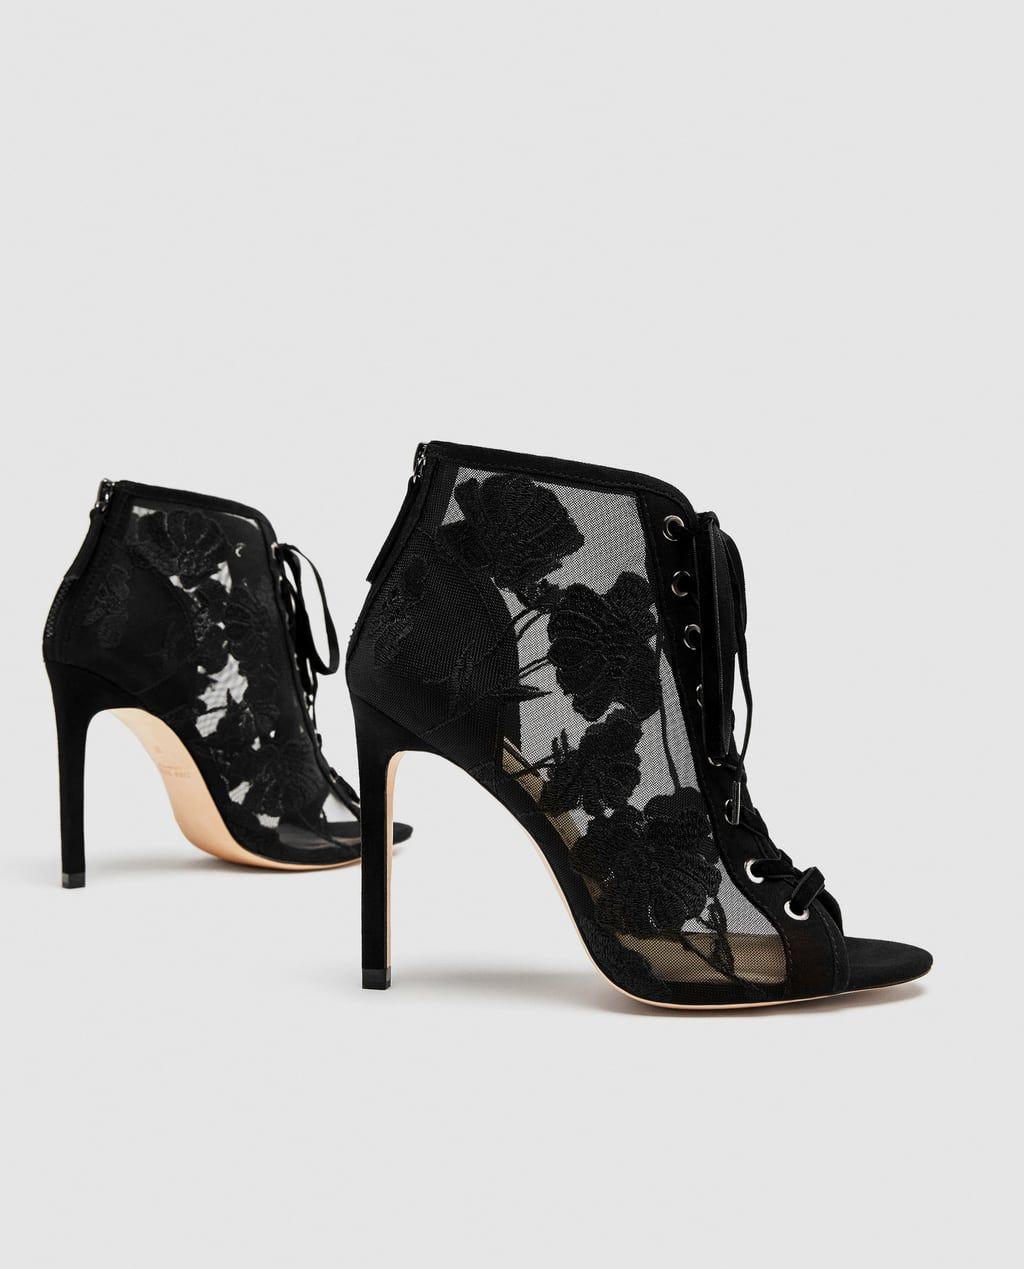 Tacón Zapatos Botín Mujer Zapatos Y Bordados Atado Zara Zapato 0qw7d60